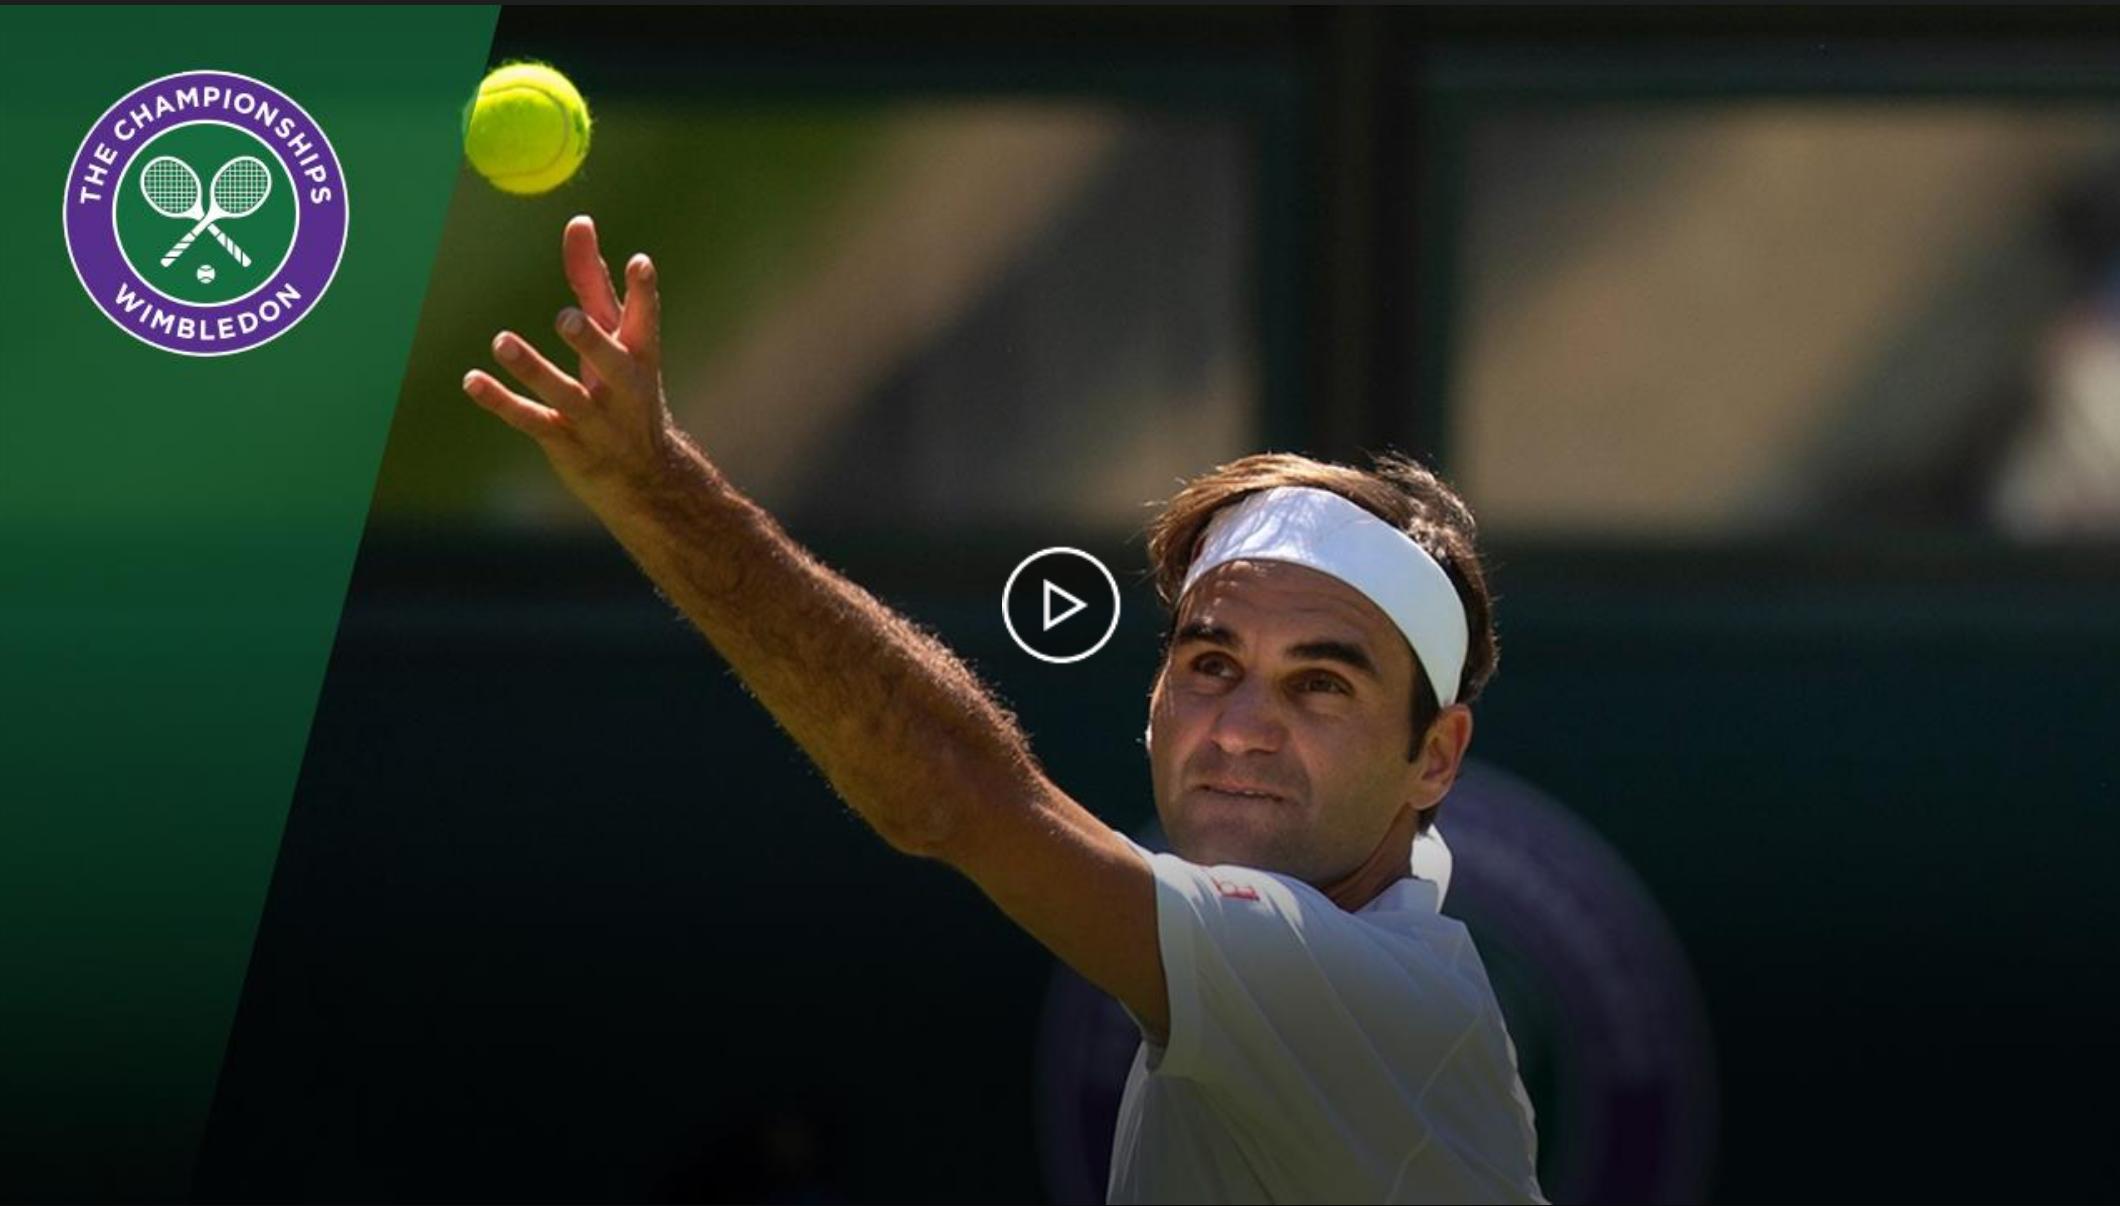 Federer Wins Wimbledon First Round Match, Wearing Uniqlo